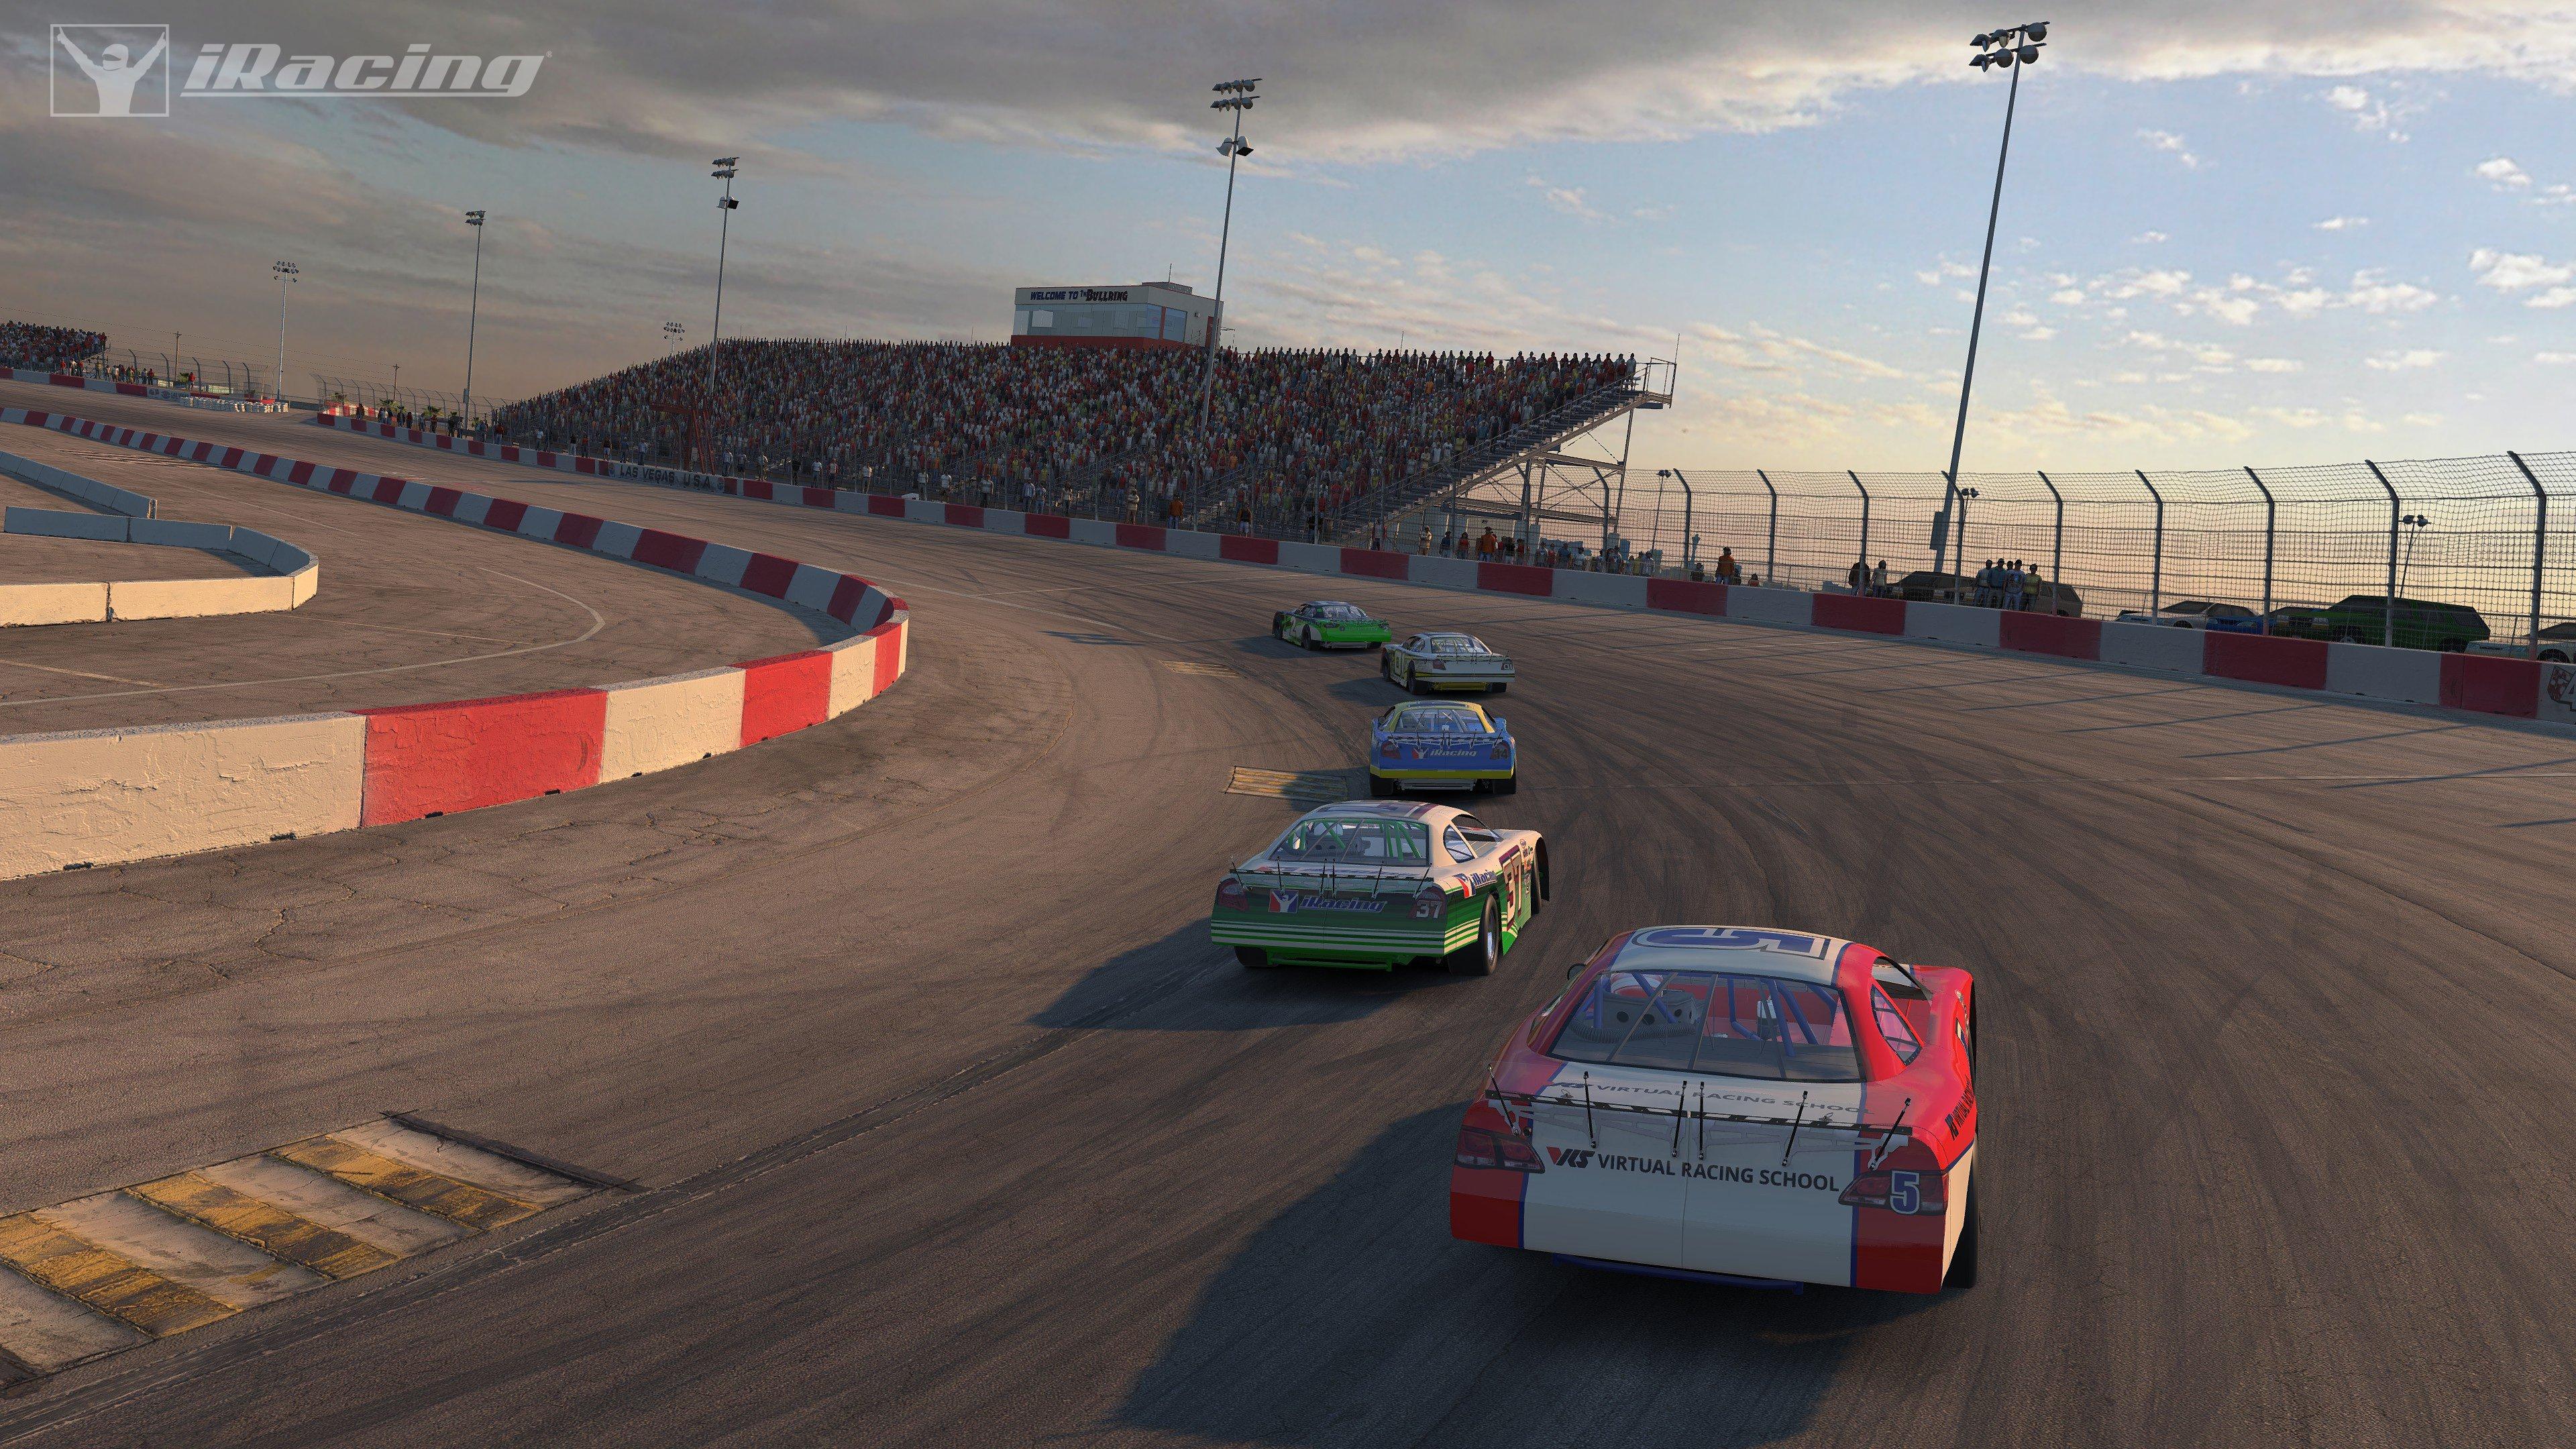 The Bullring at Las Vegas Motor Speedway Coming to iRacing - Inside